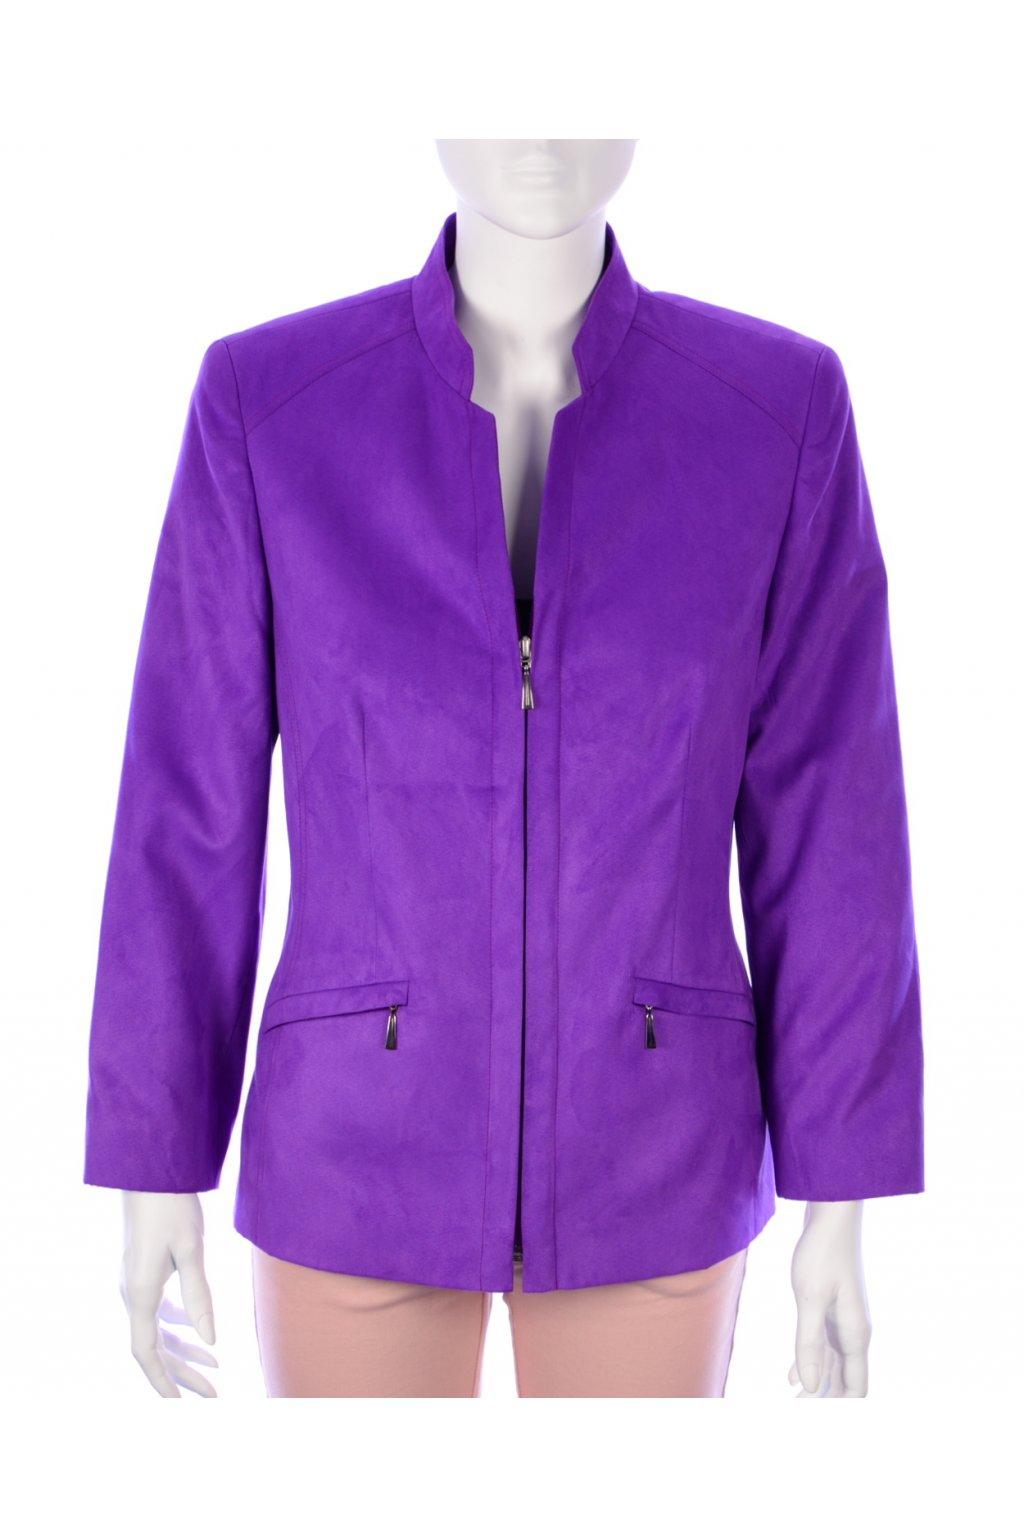 Kabátek bunda lehký fialový vel. 38 / uk 12 /  M